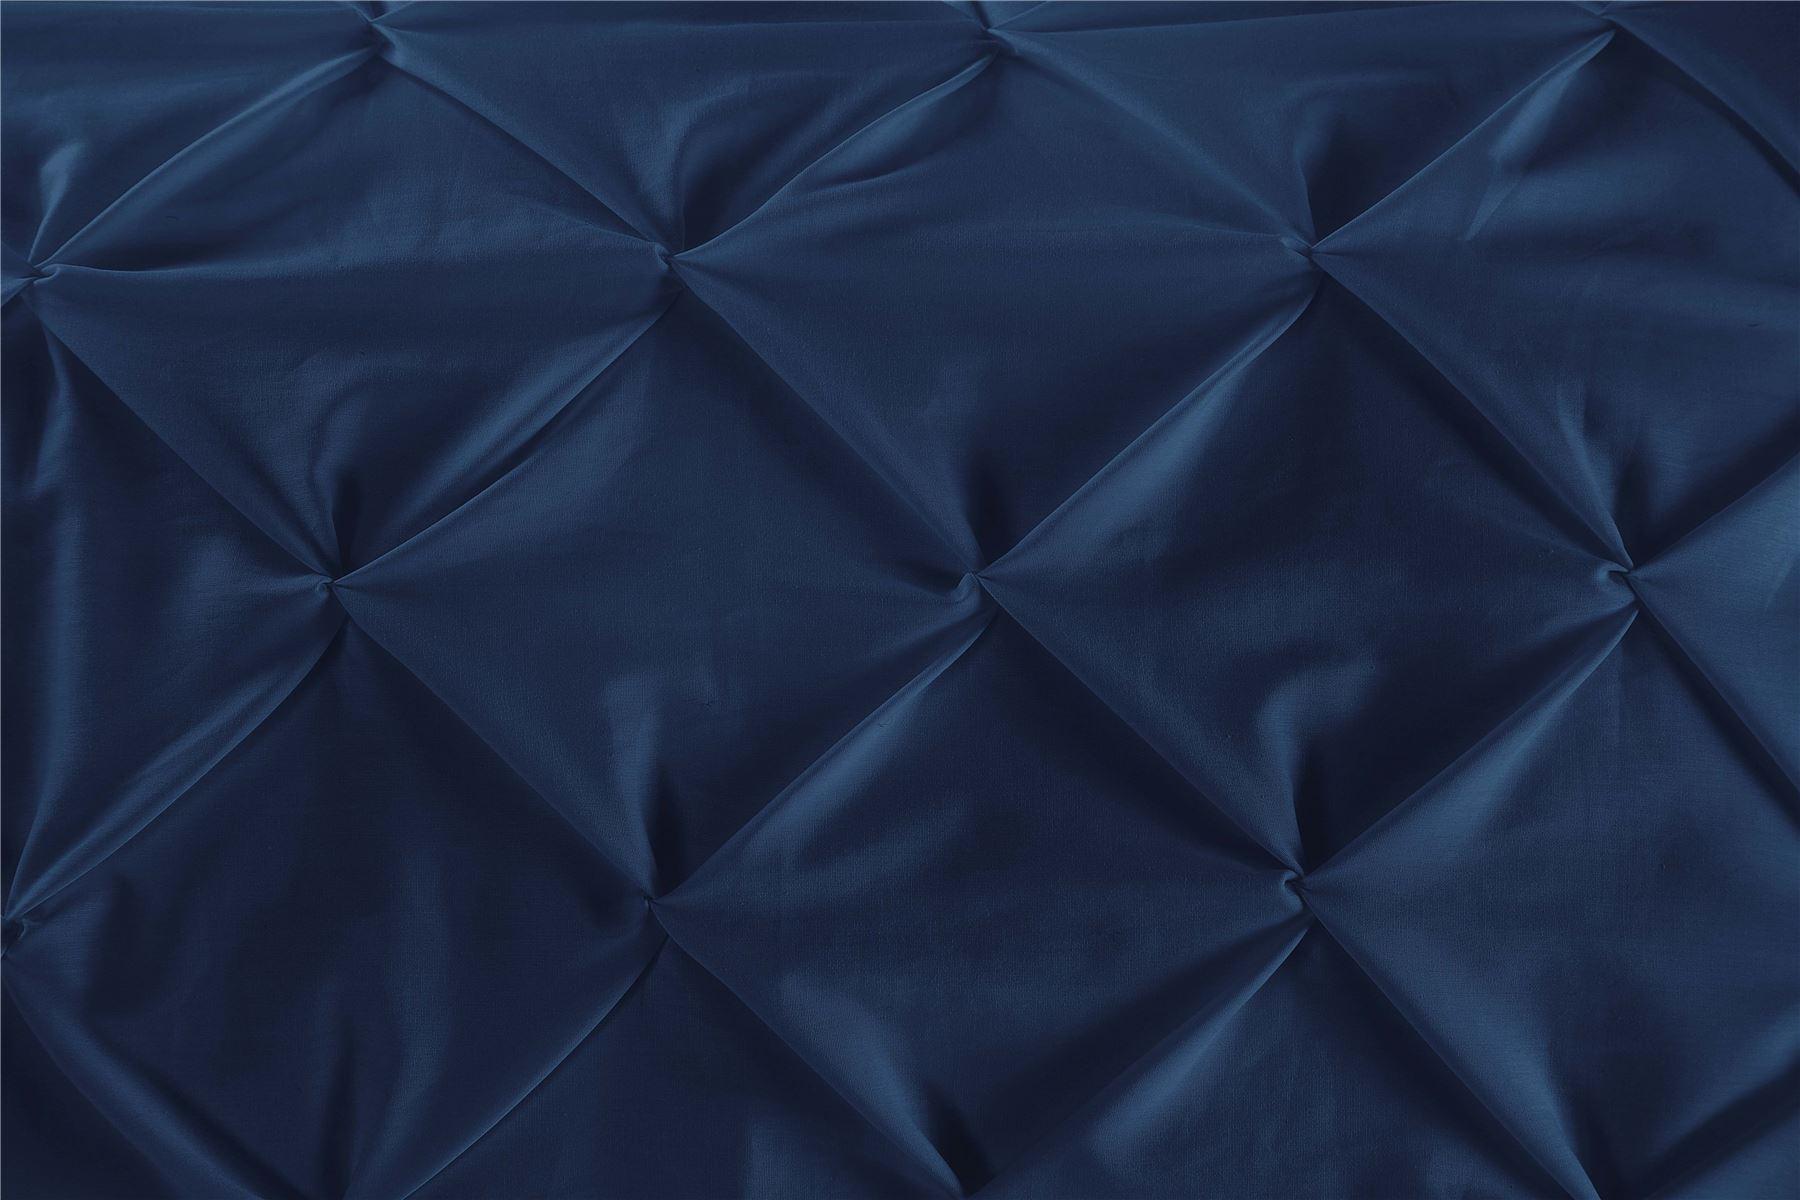 Luxury-Pure-100-Cotton-200-Thread-Pinch-Pleat-Pintuck-Puckering-Duvet-Cover-Set thumbnail 21